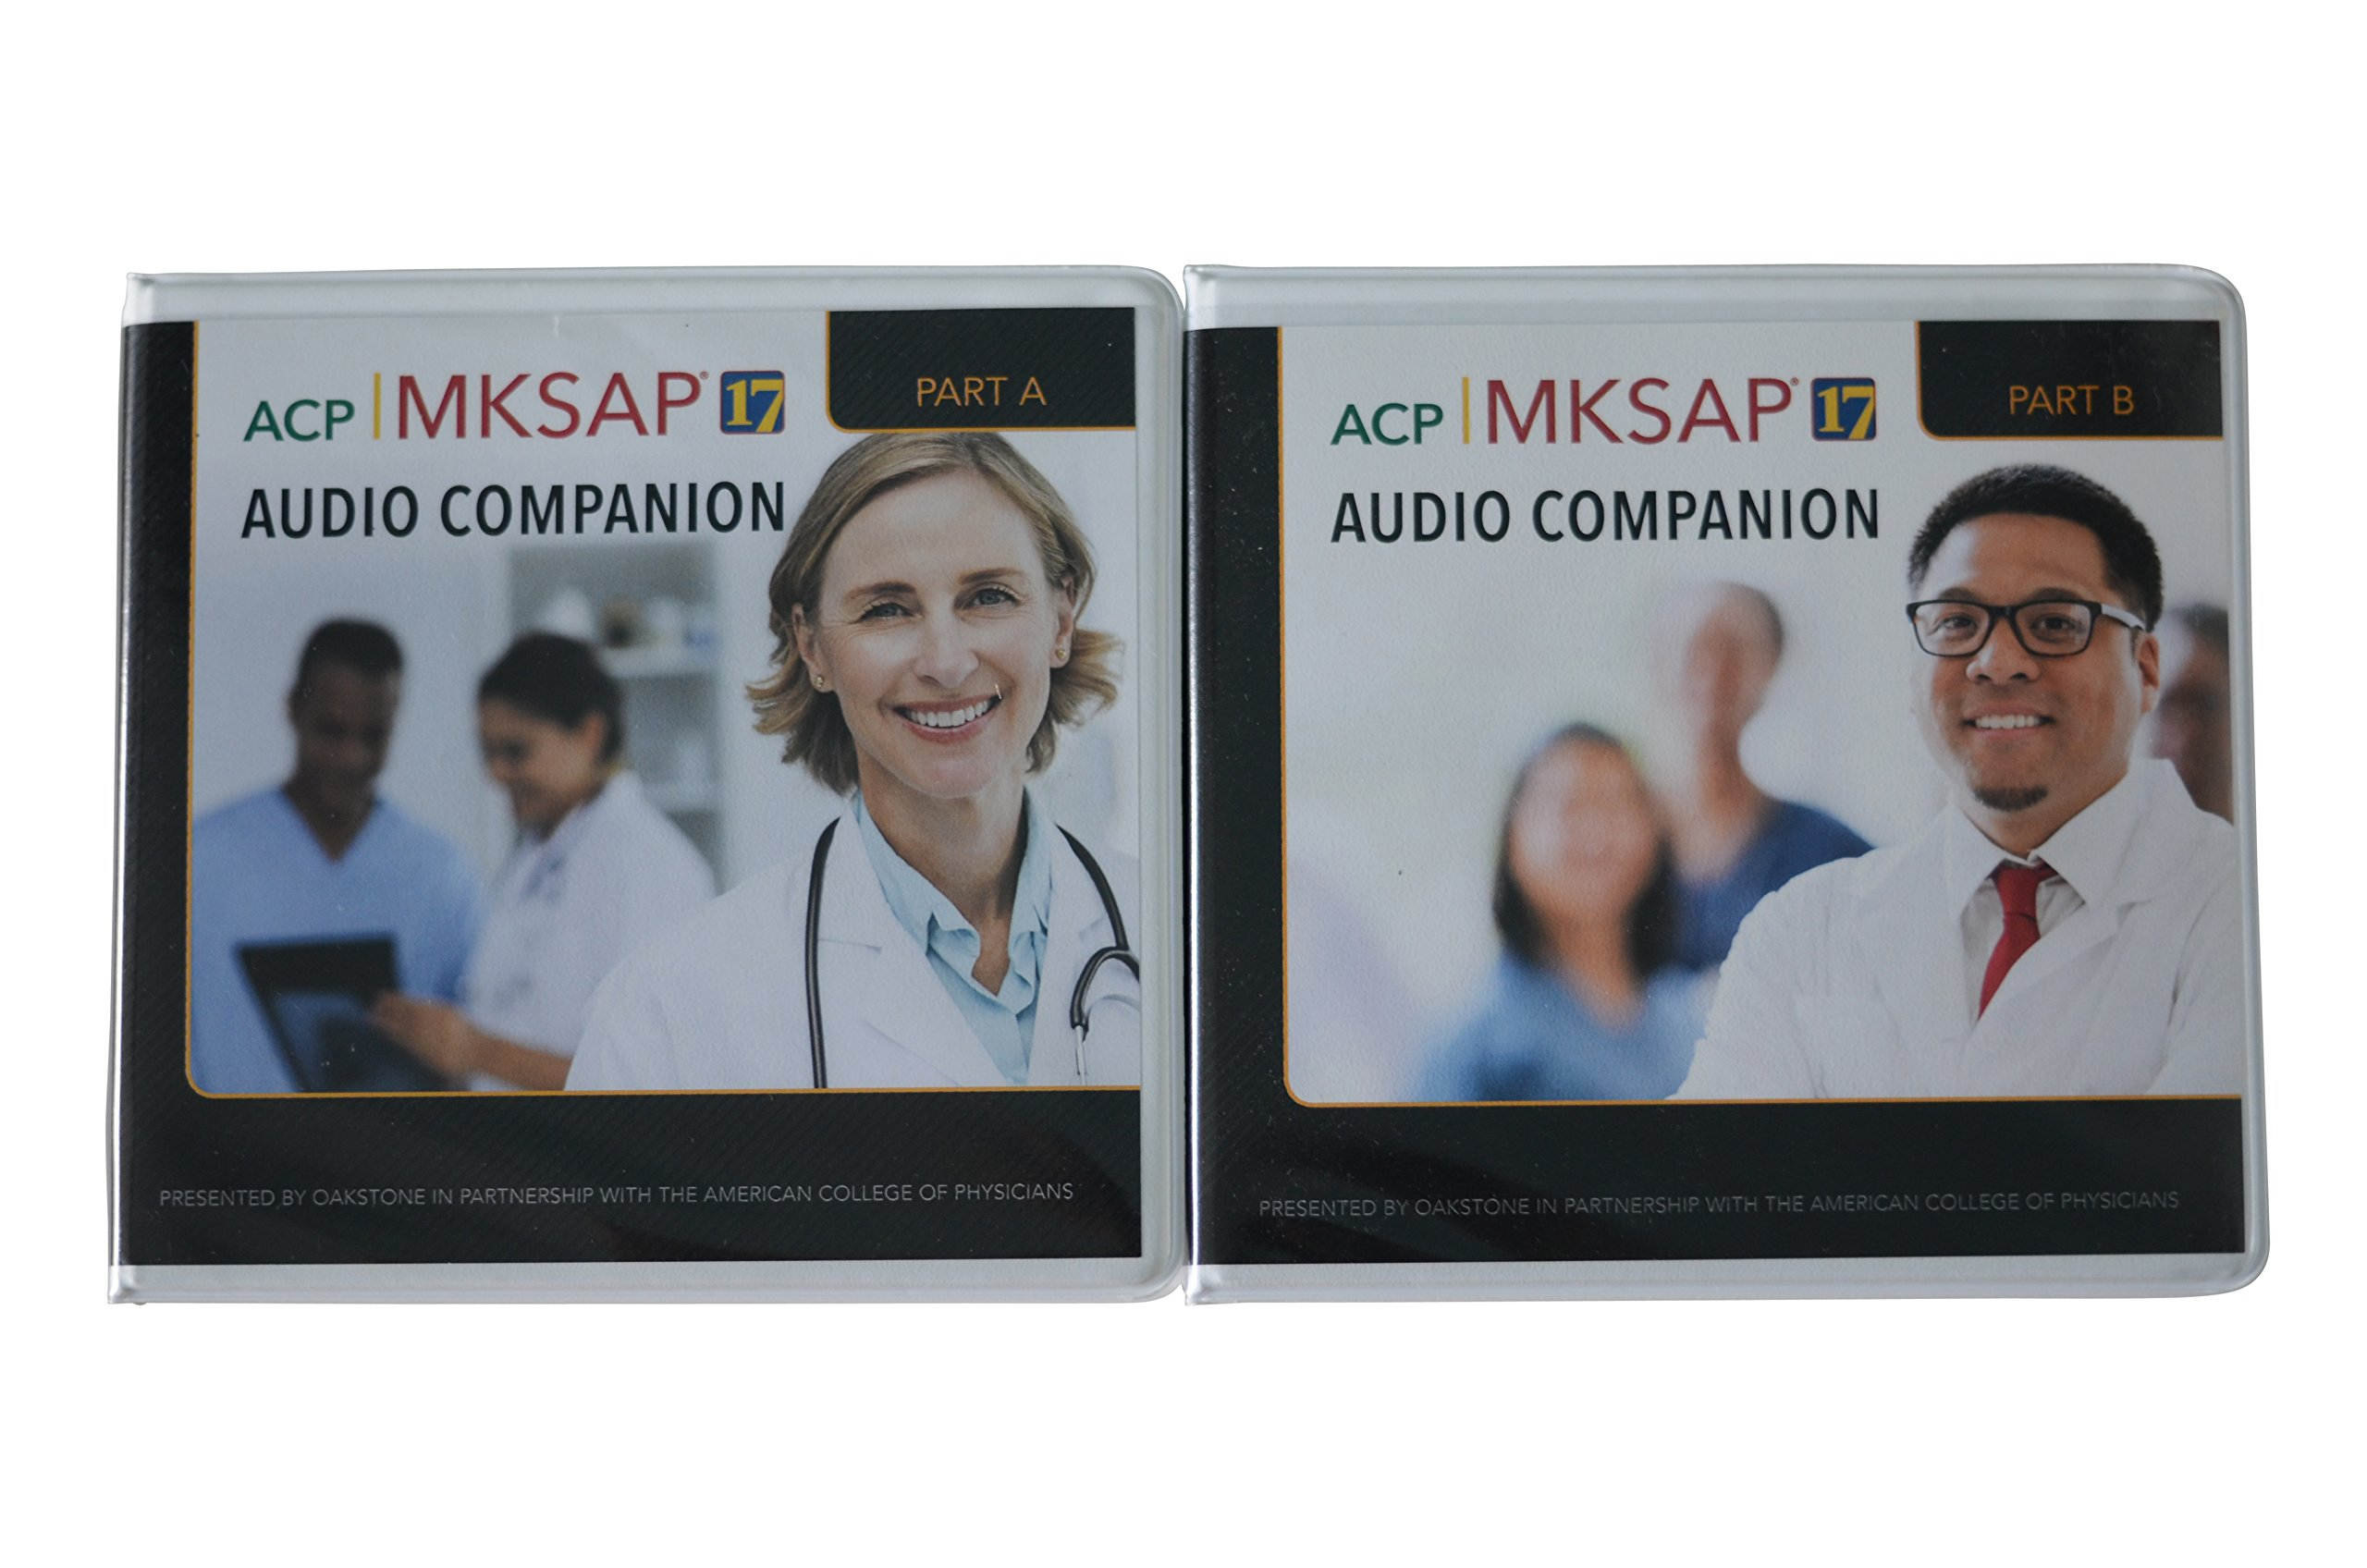 MKSAP 17 Audio Companion & QA Session